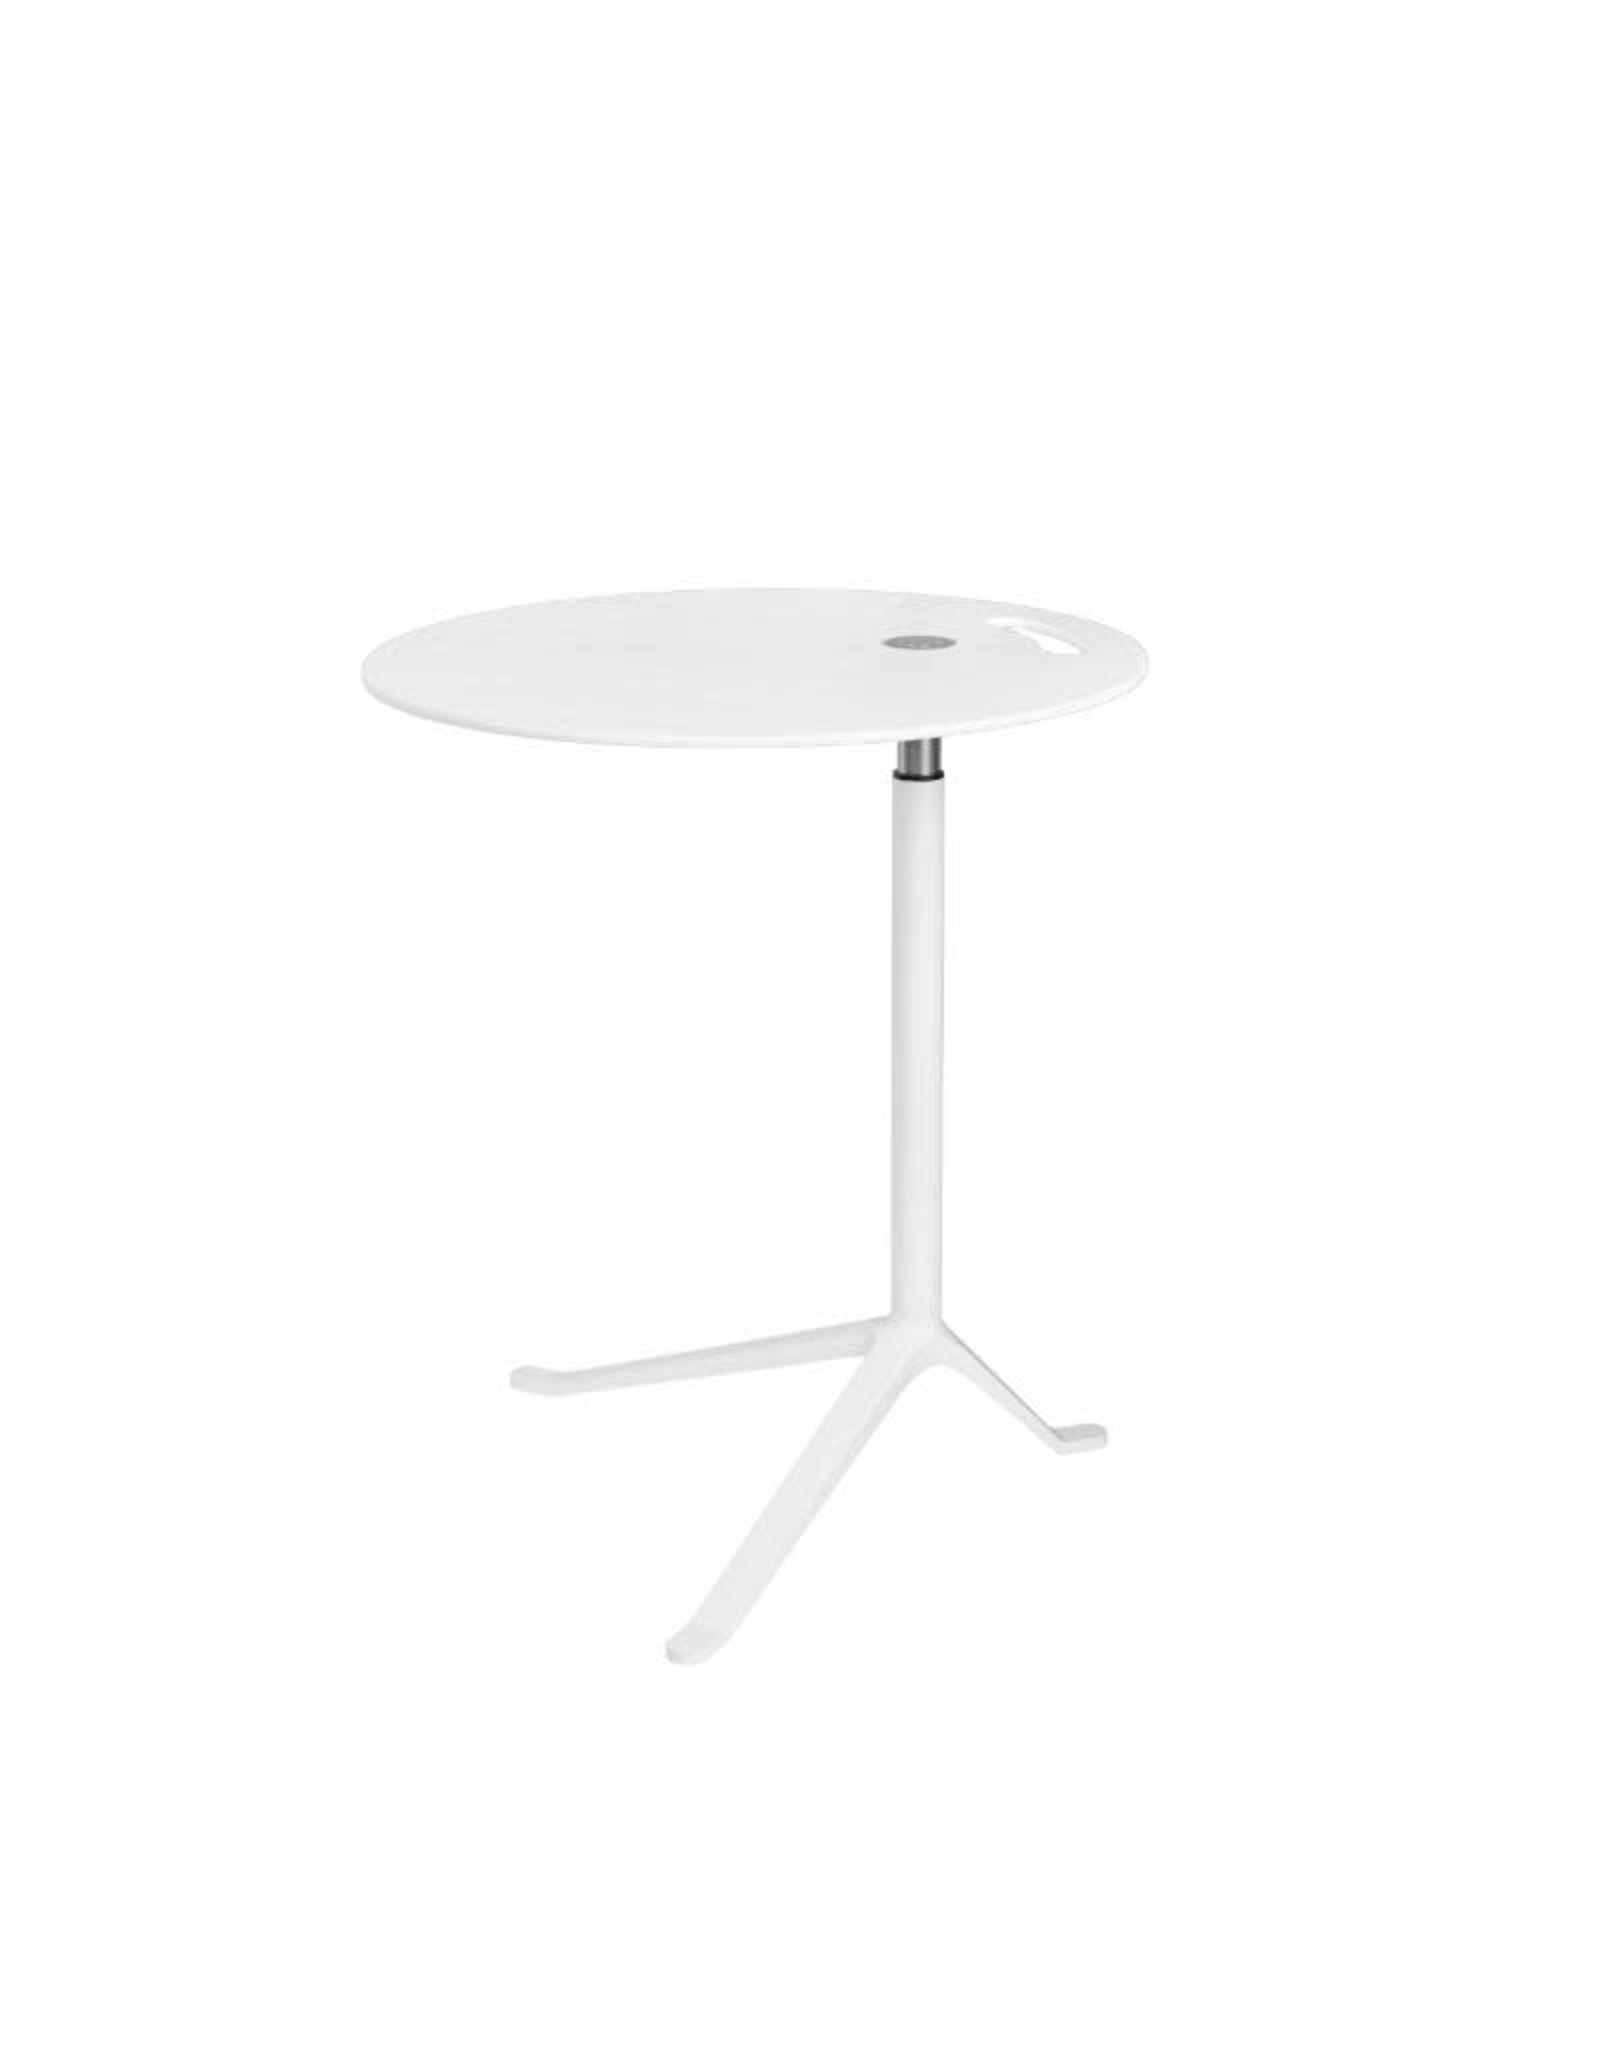 KS11 LITTLE FRIEND TABLE IN WHITE